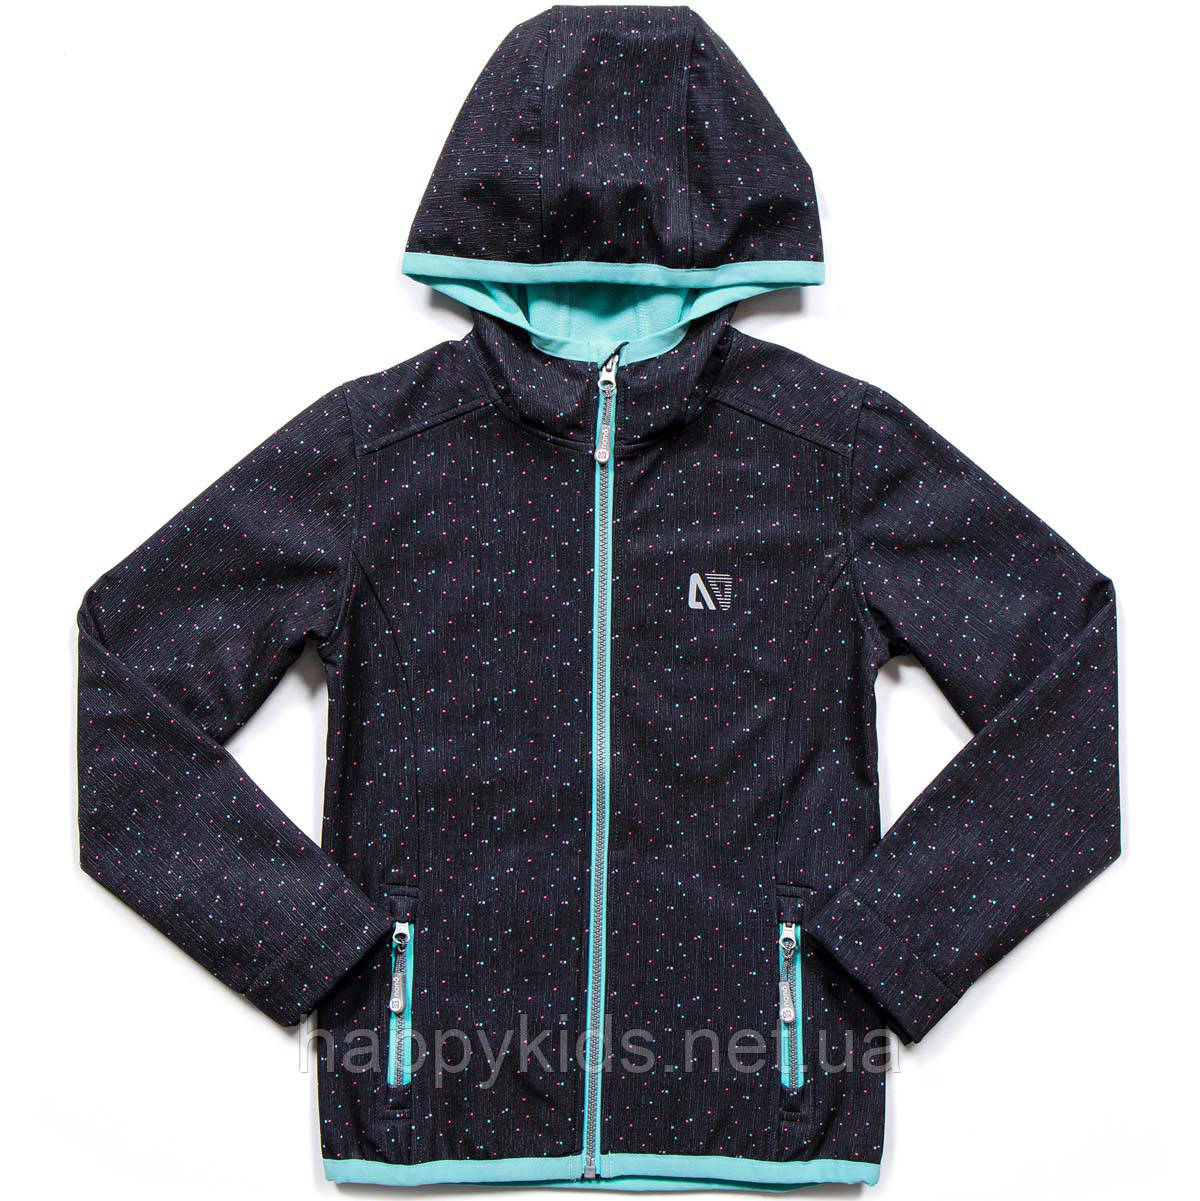 Демисезонная куртка для девочки SOFTSHELL NANO 1400 M S18 Dk Mouse Confe. Размер 100-144.